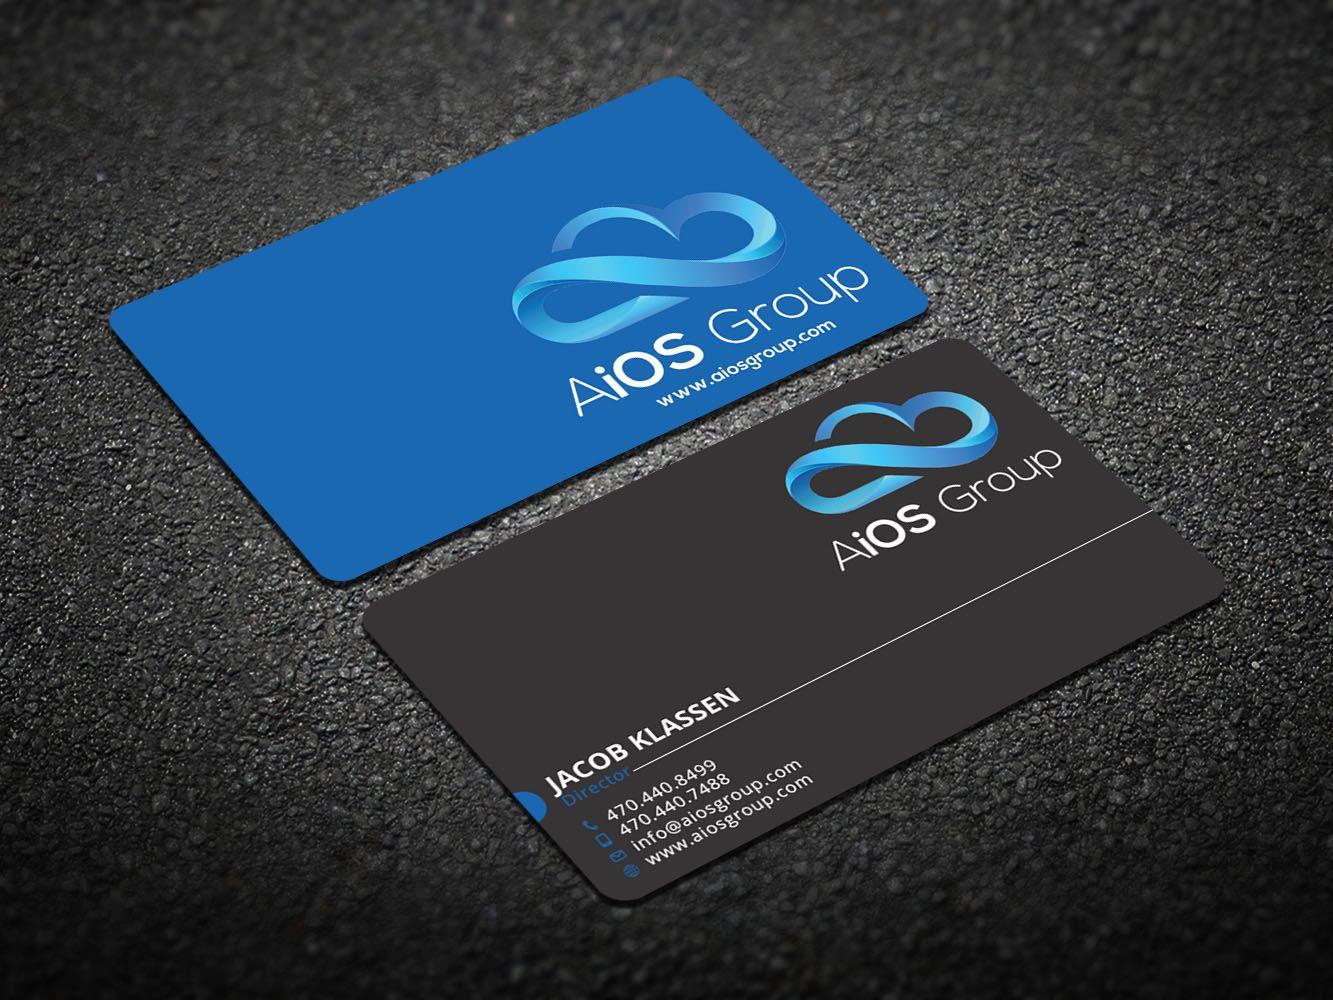 184 Upmarket Business Card Designs Information Technology Business Card Design Project For A Business In United States Business Card Design Company Business Cards Elegant Business Cards Design